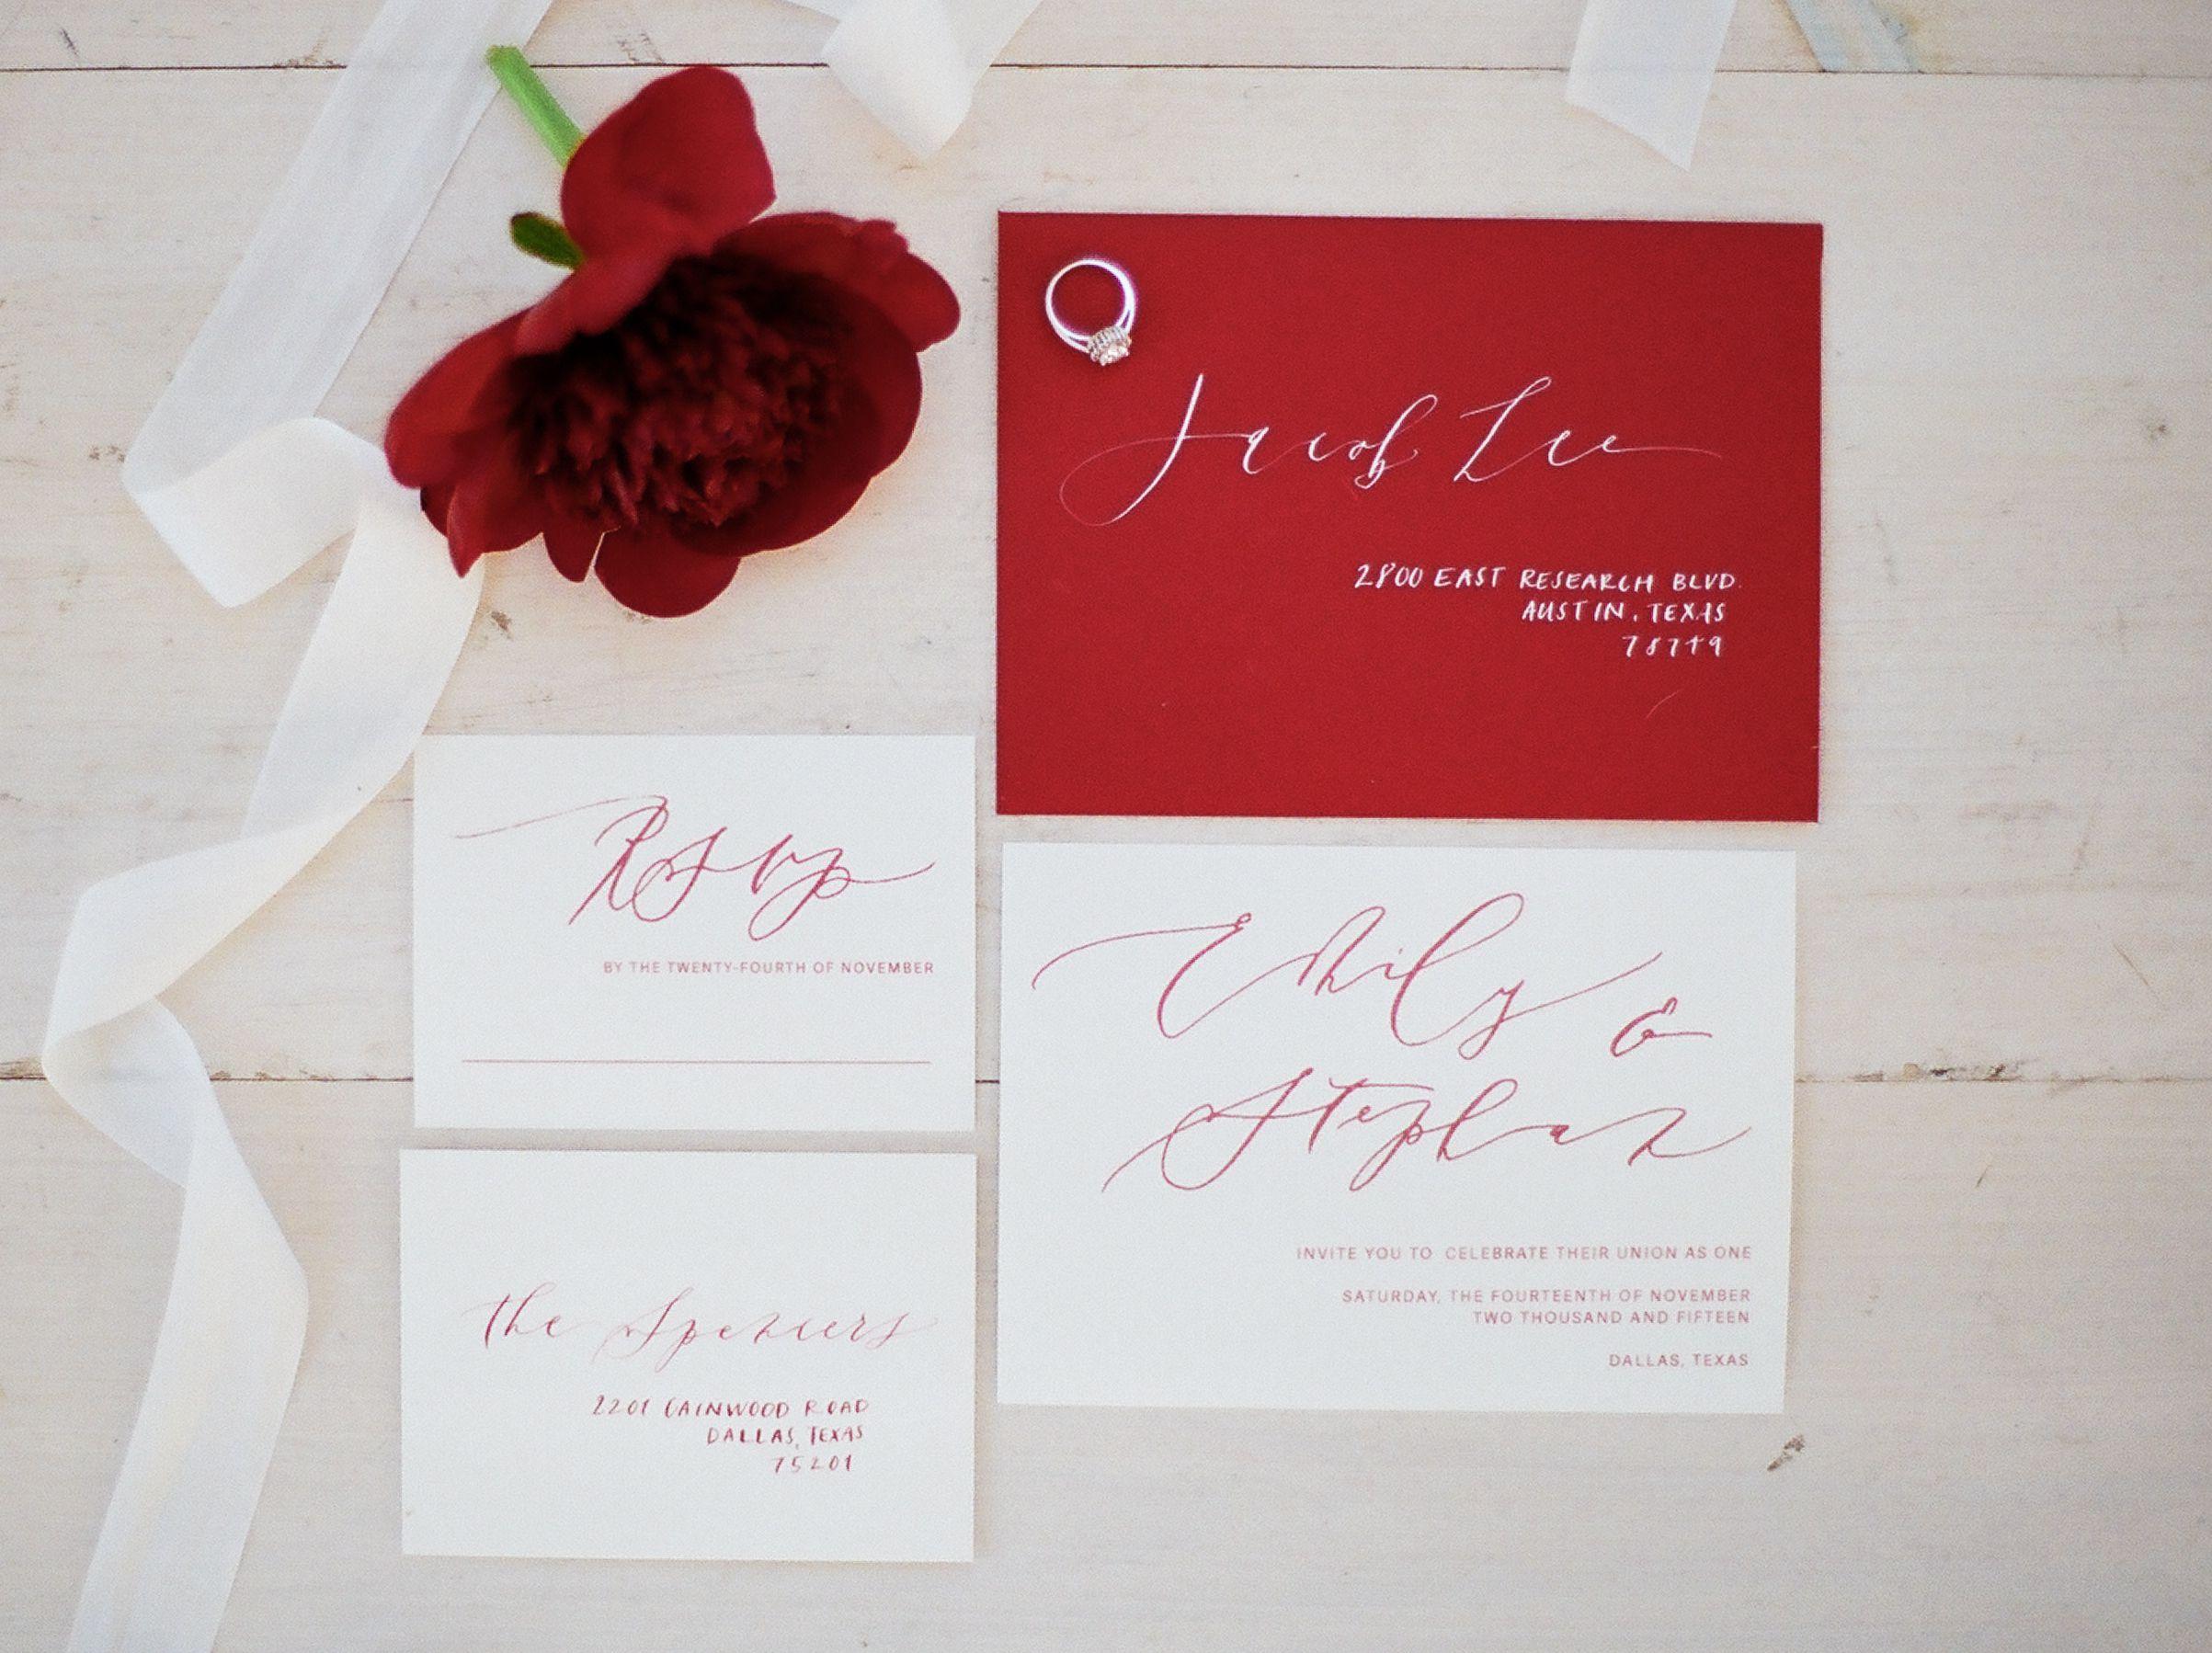 Perfect Wedding Invitations Austin Tx Image - Invitations and ...